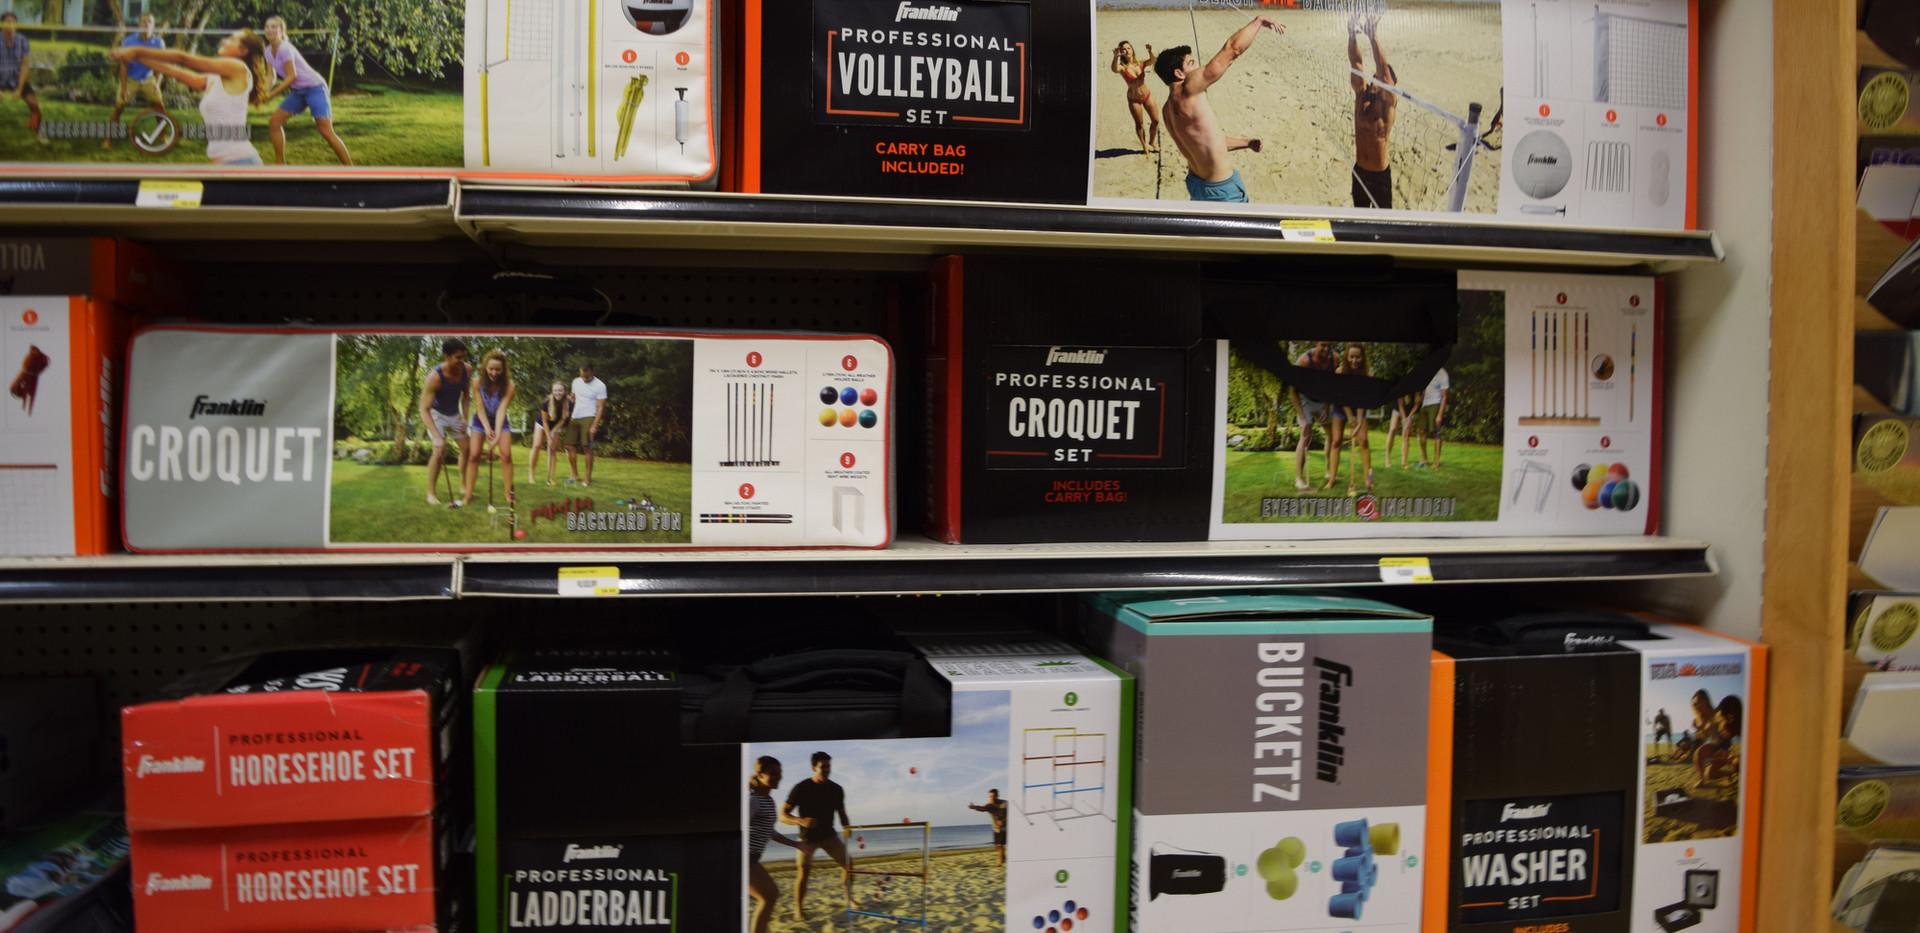 Franklin Croquet, Ladderball, & Volleyball Sets